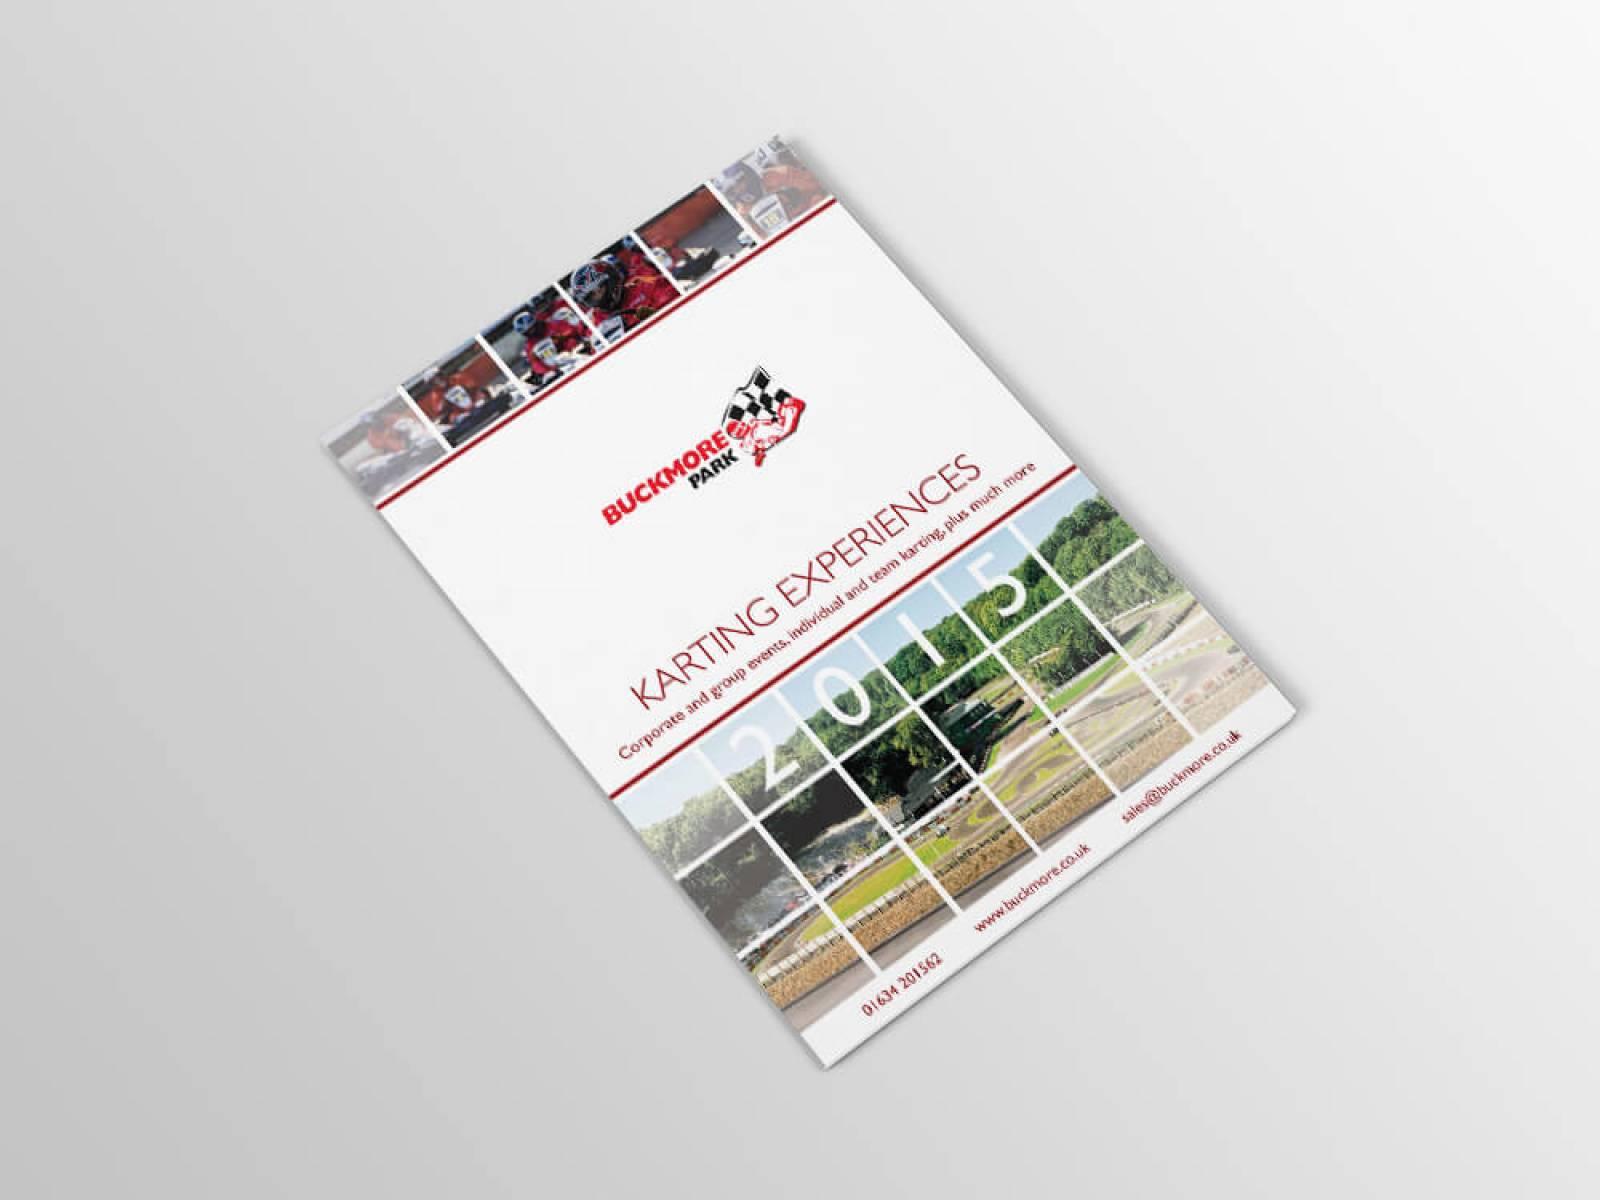 Brochure-Buckmore-park-brochure-1-design-agency-graphic-design-canterbury.jpg